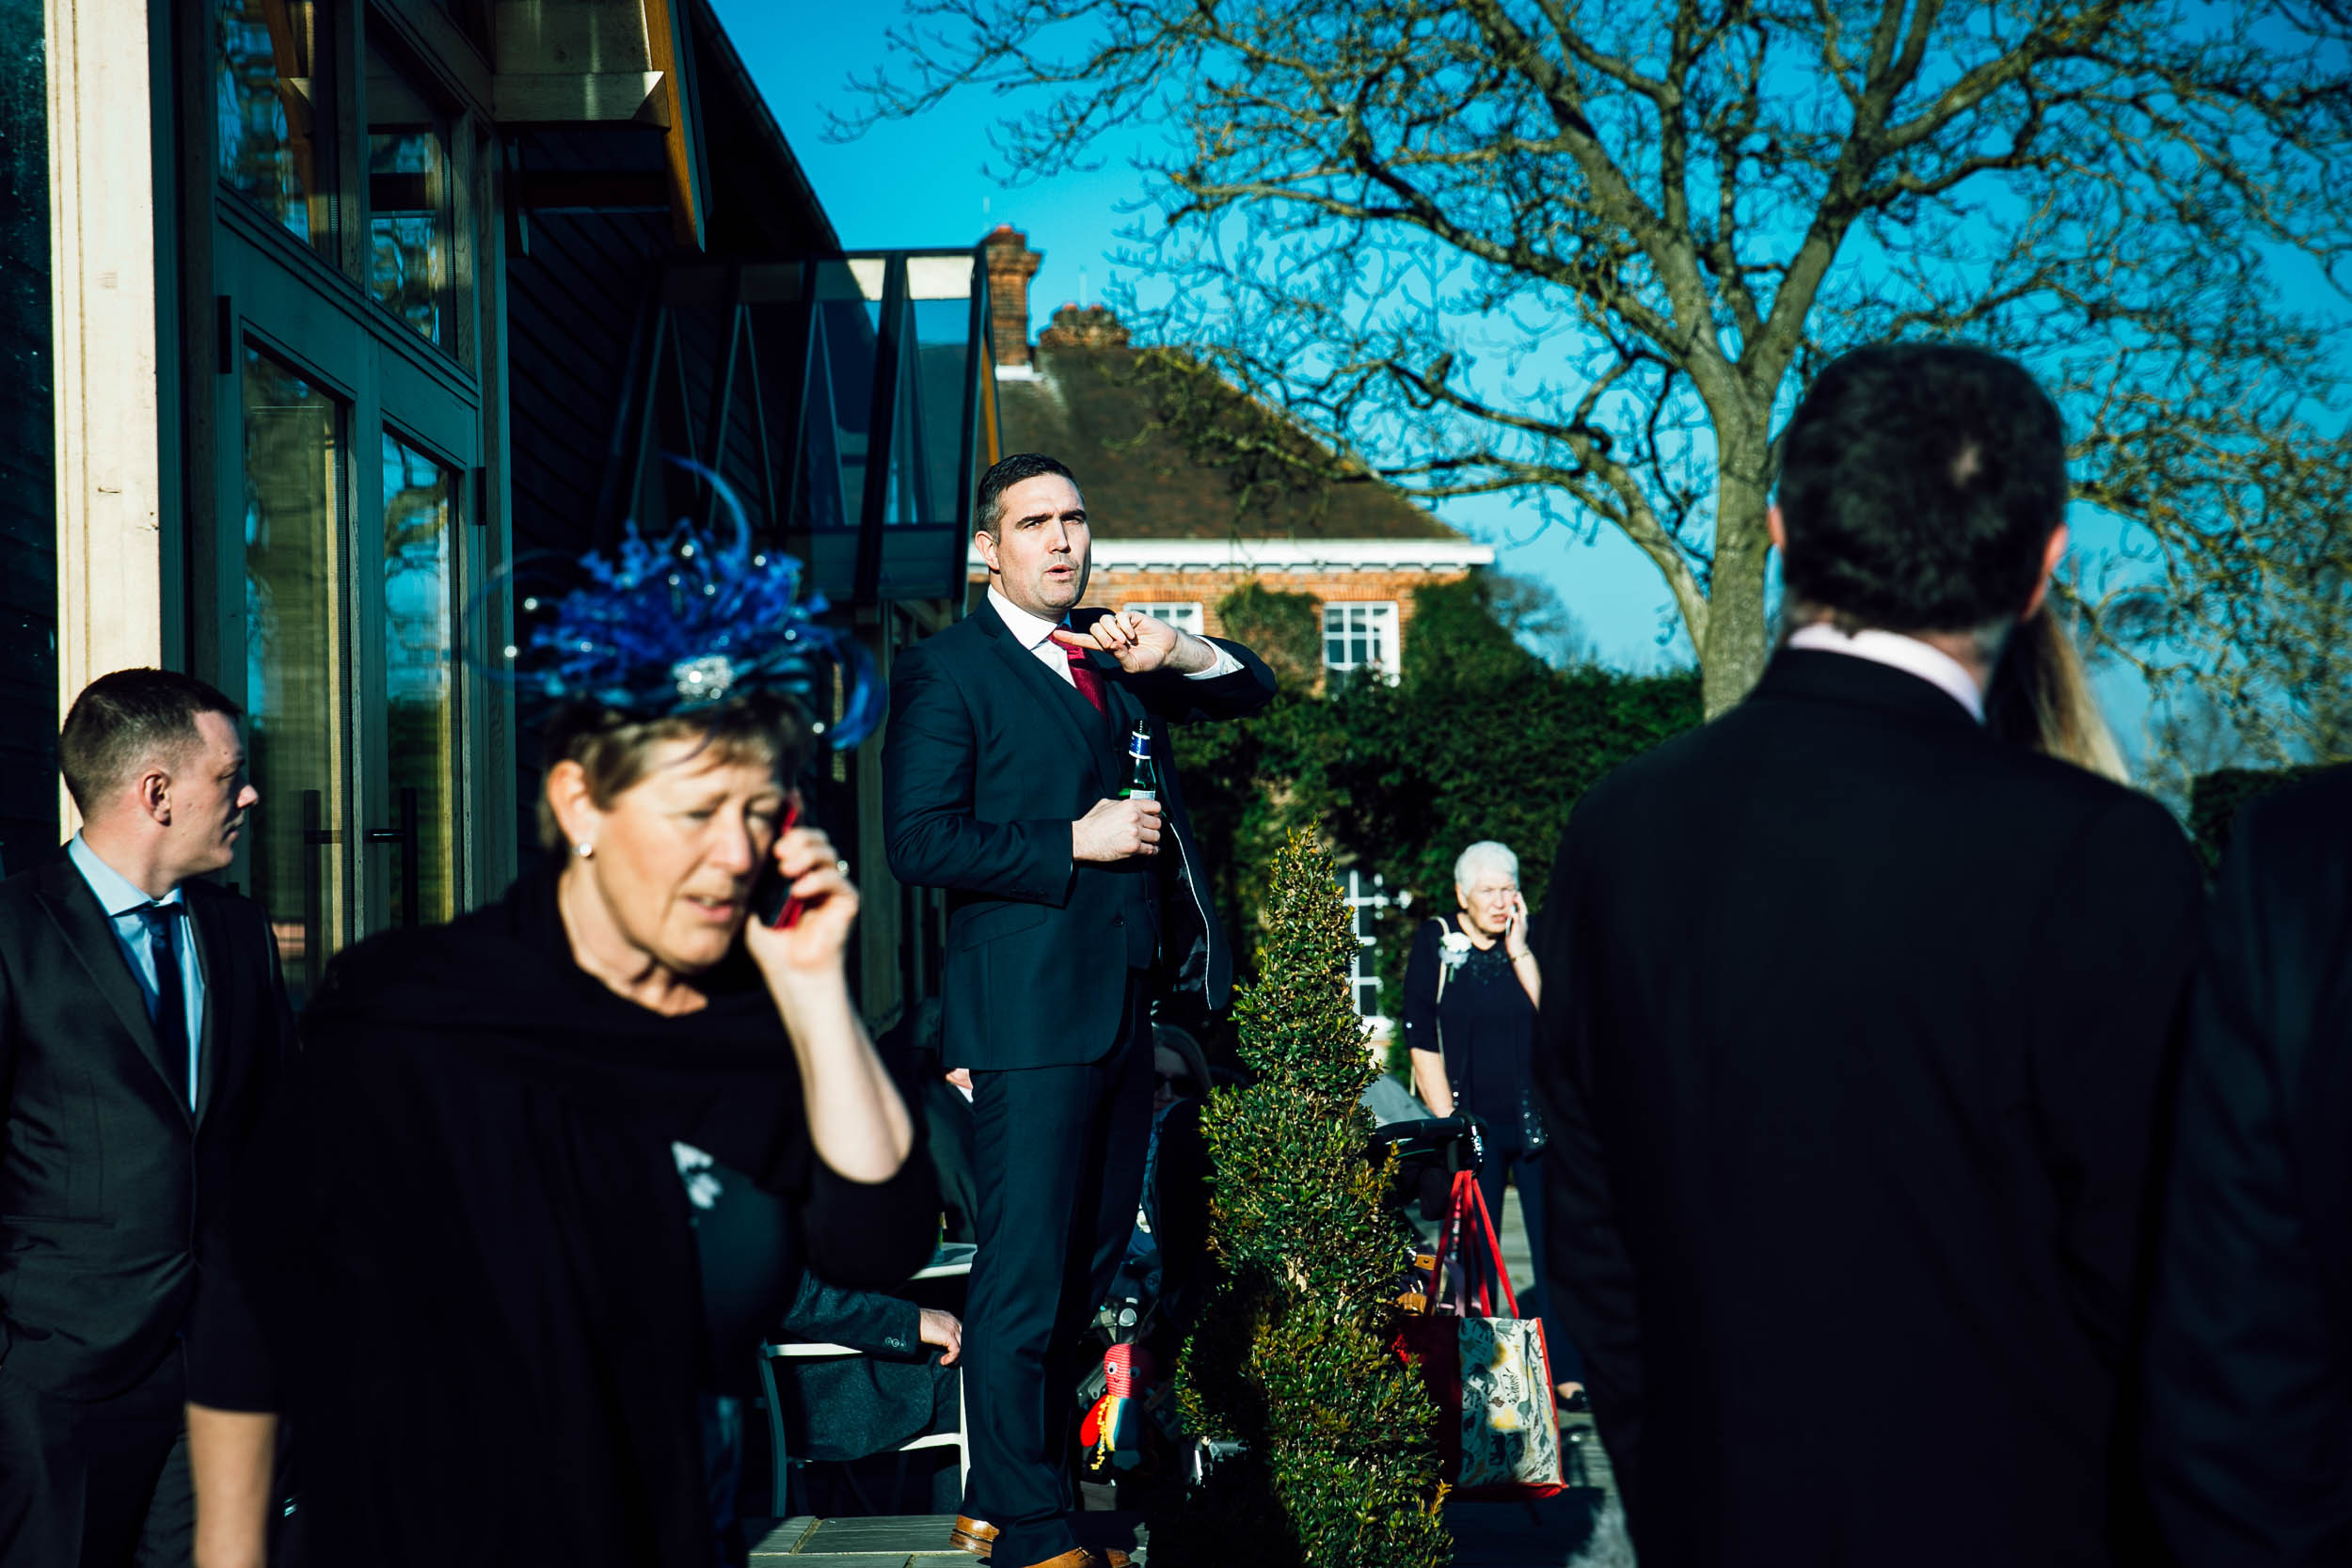 micklefield-hall-wedding-photographer 063.jpg